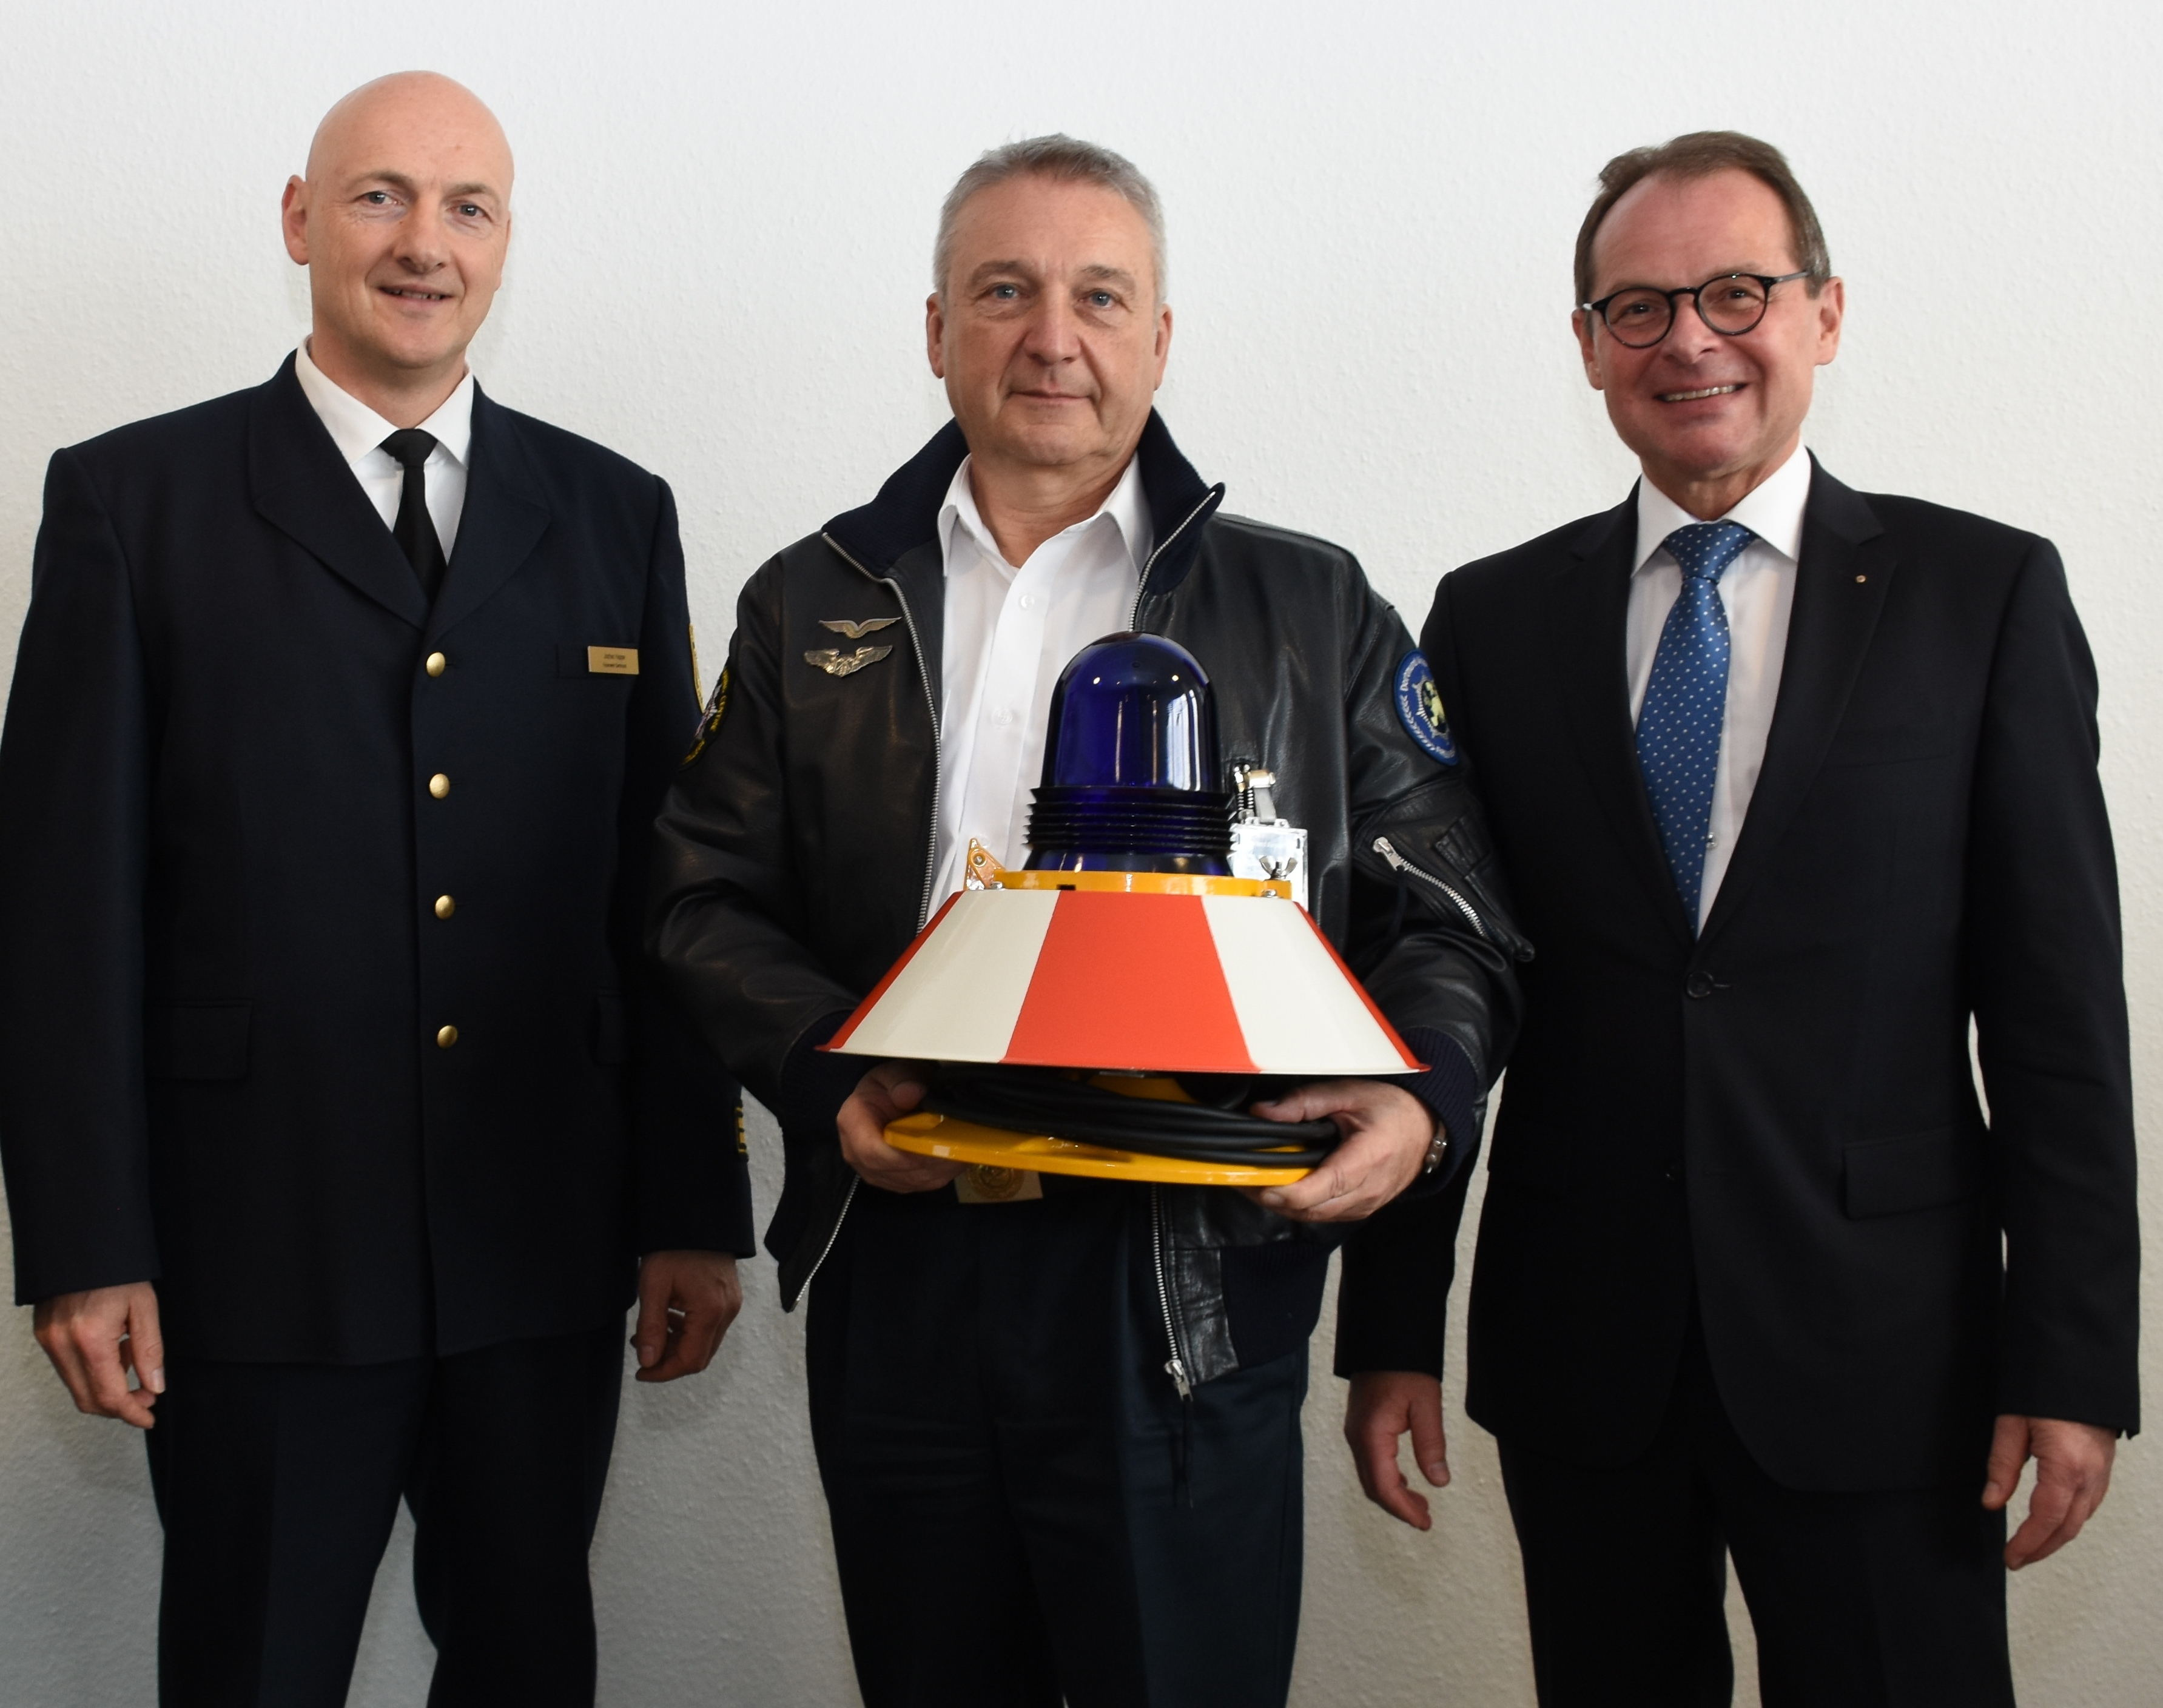 Branoberamtsrat Rüdiger Schulz ging in den Ruhestand (Foto: OTS)